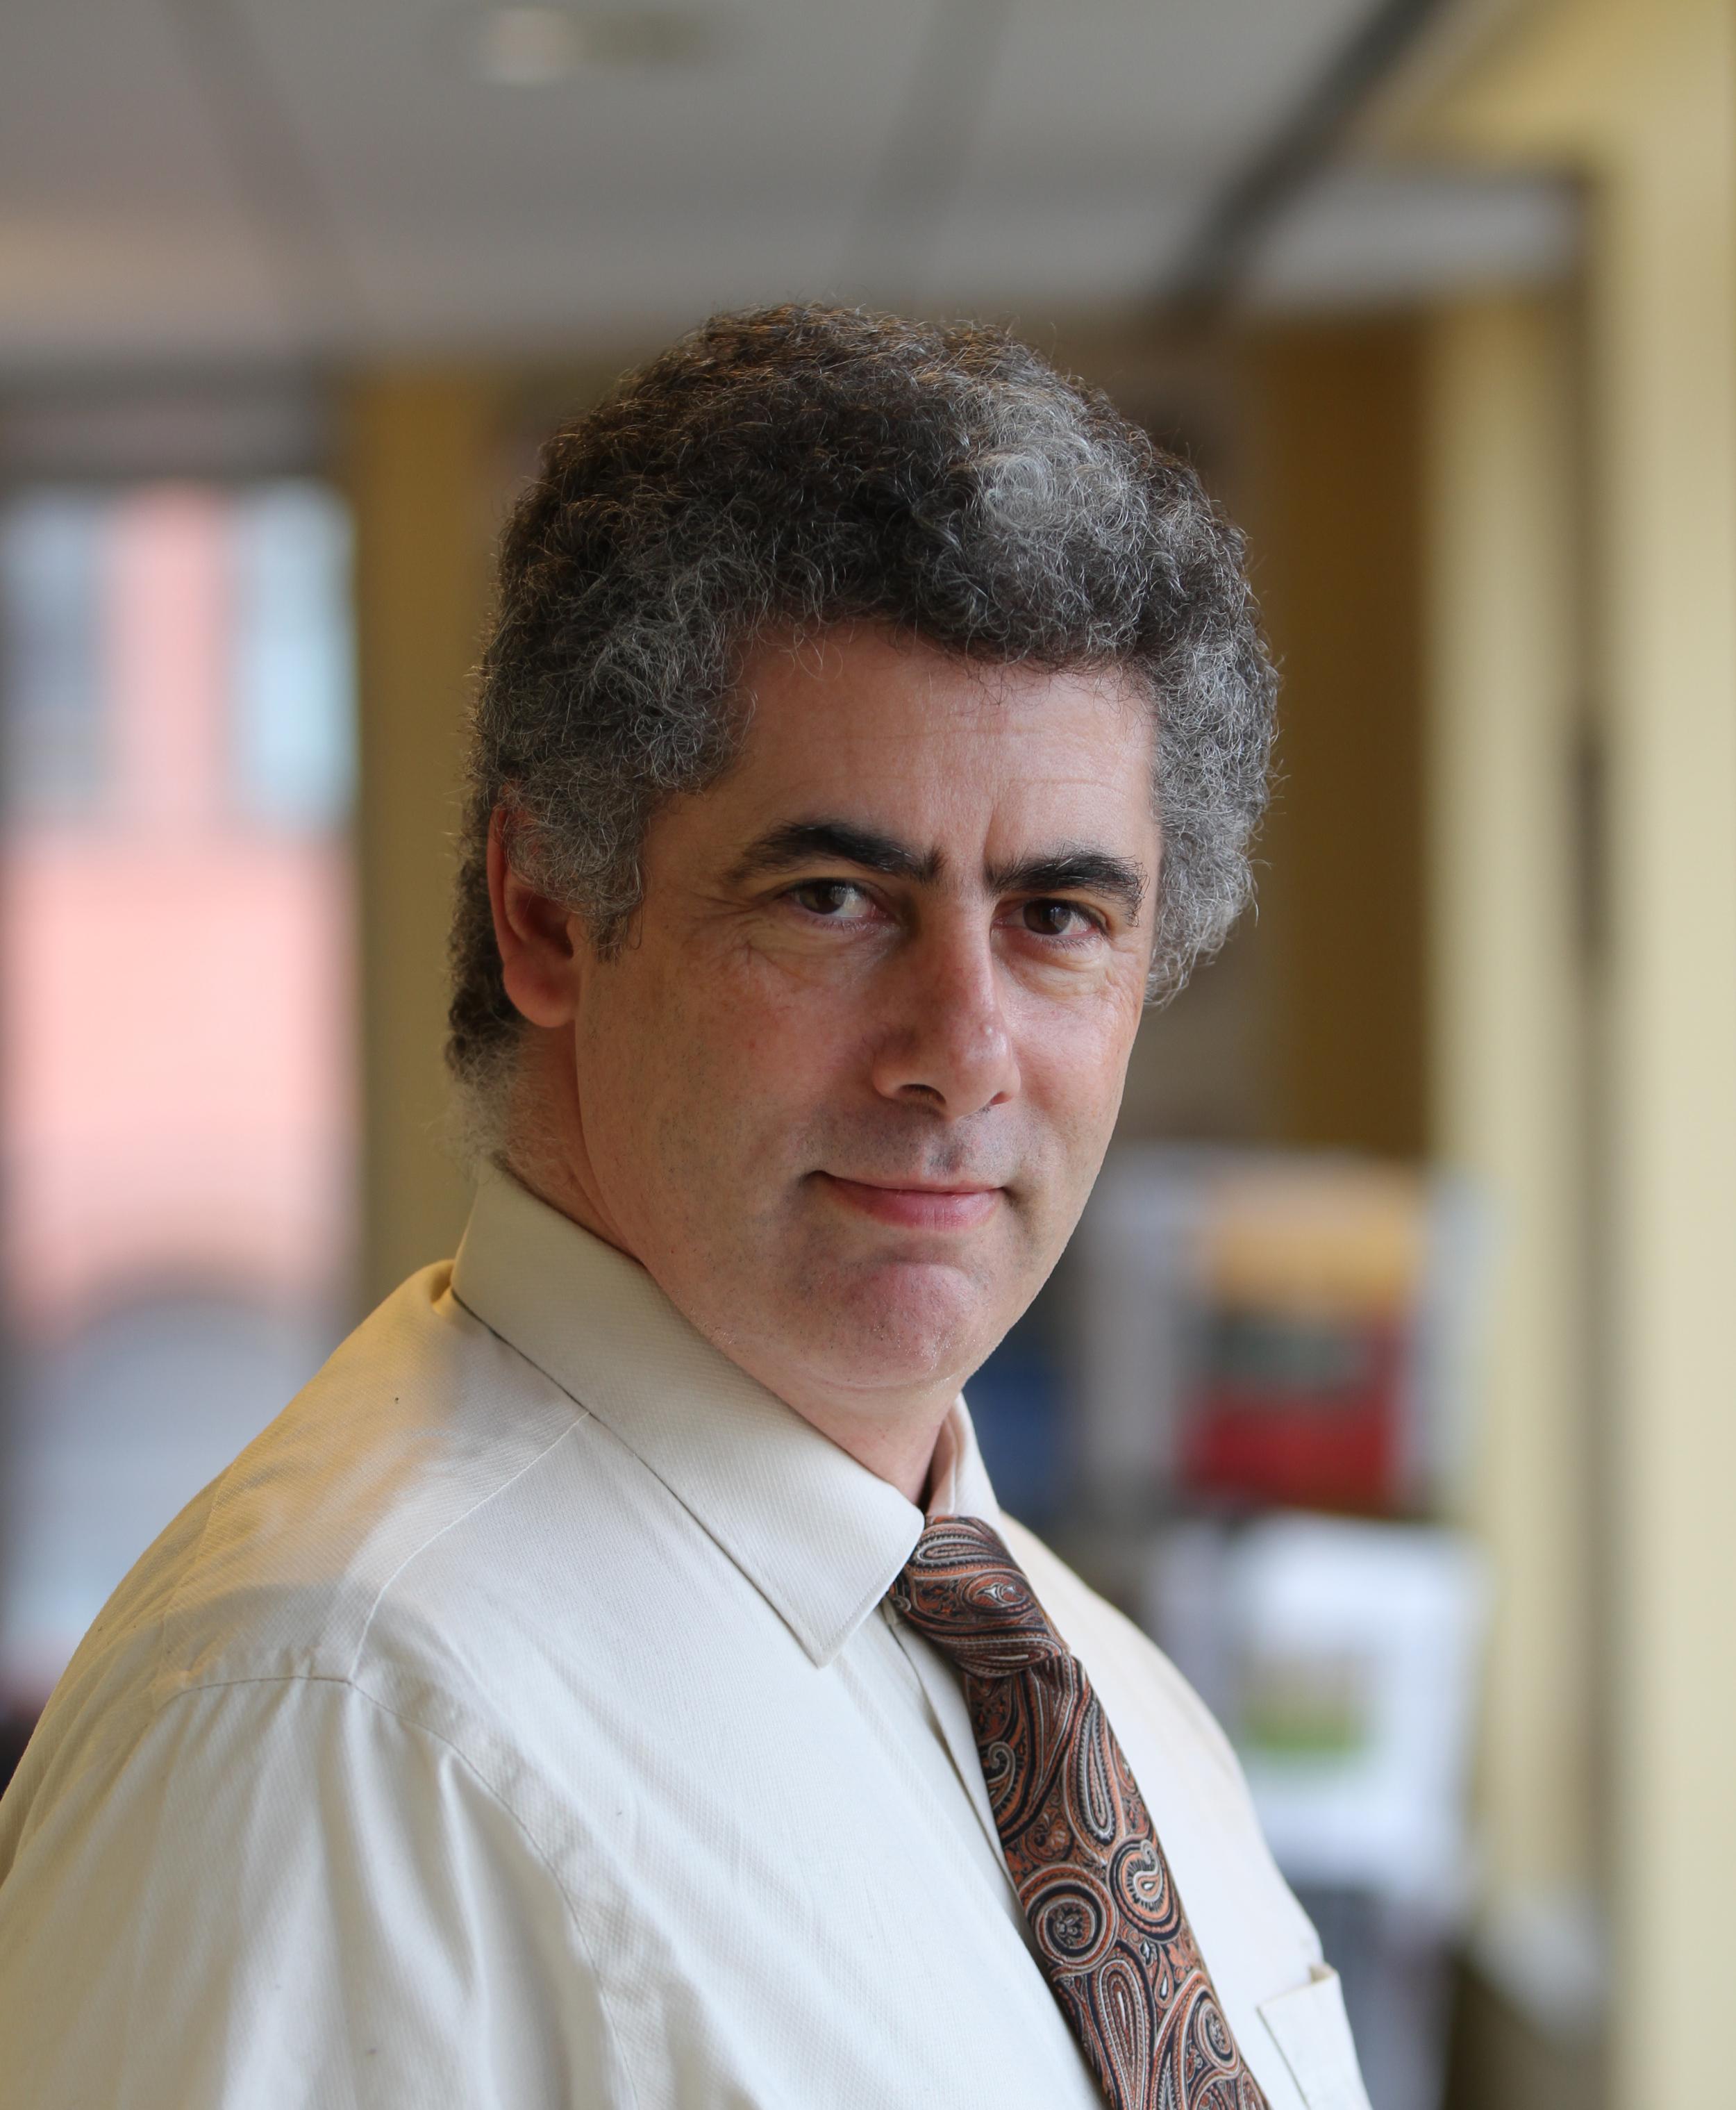 Tom Parris, President